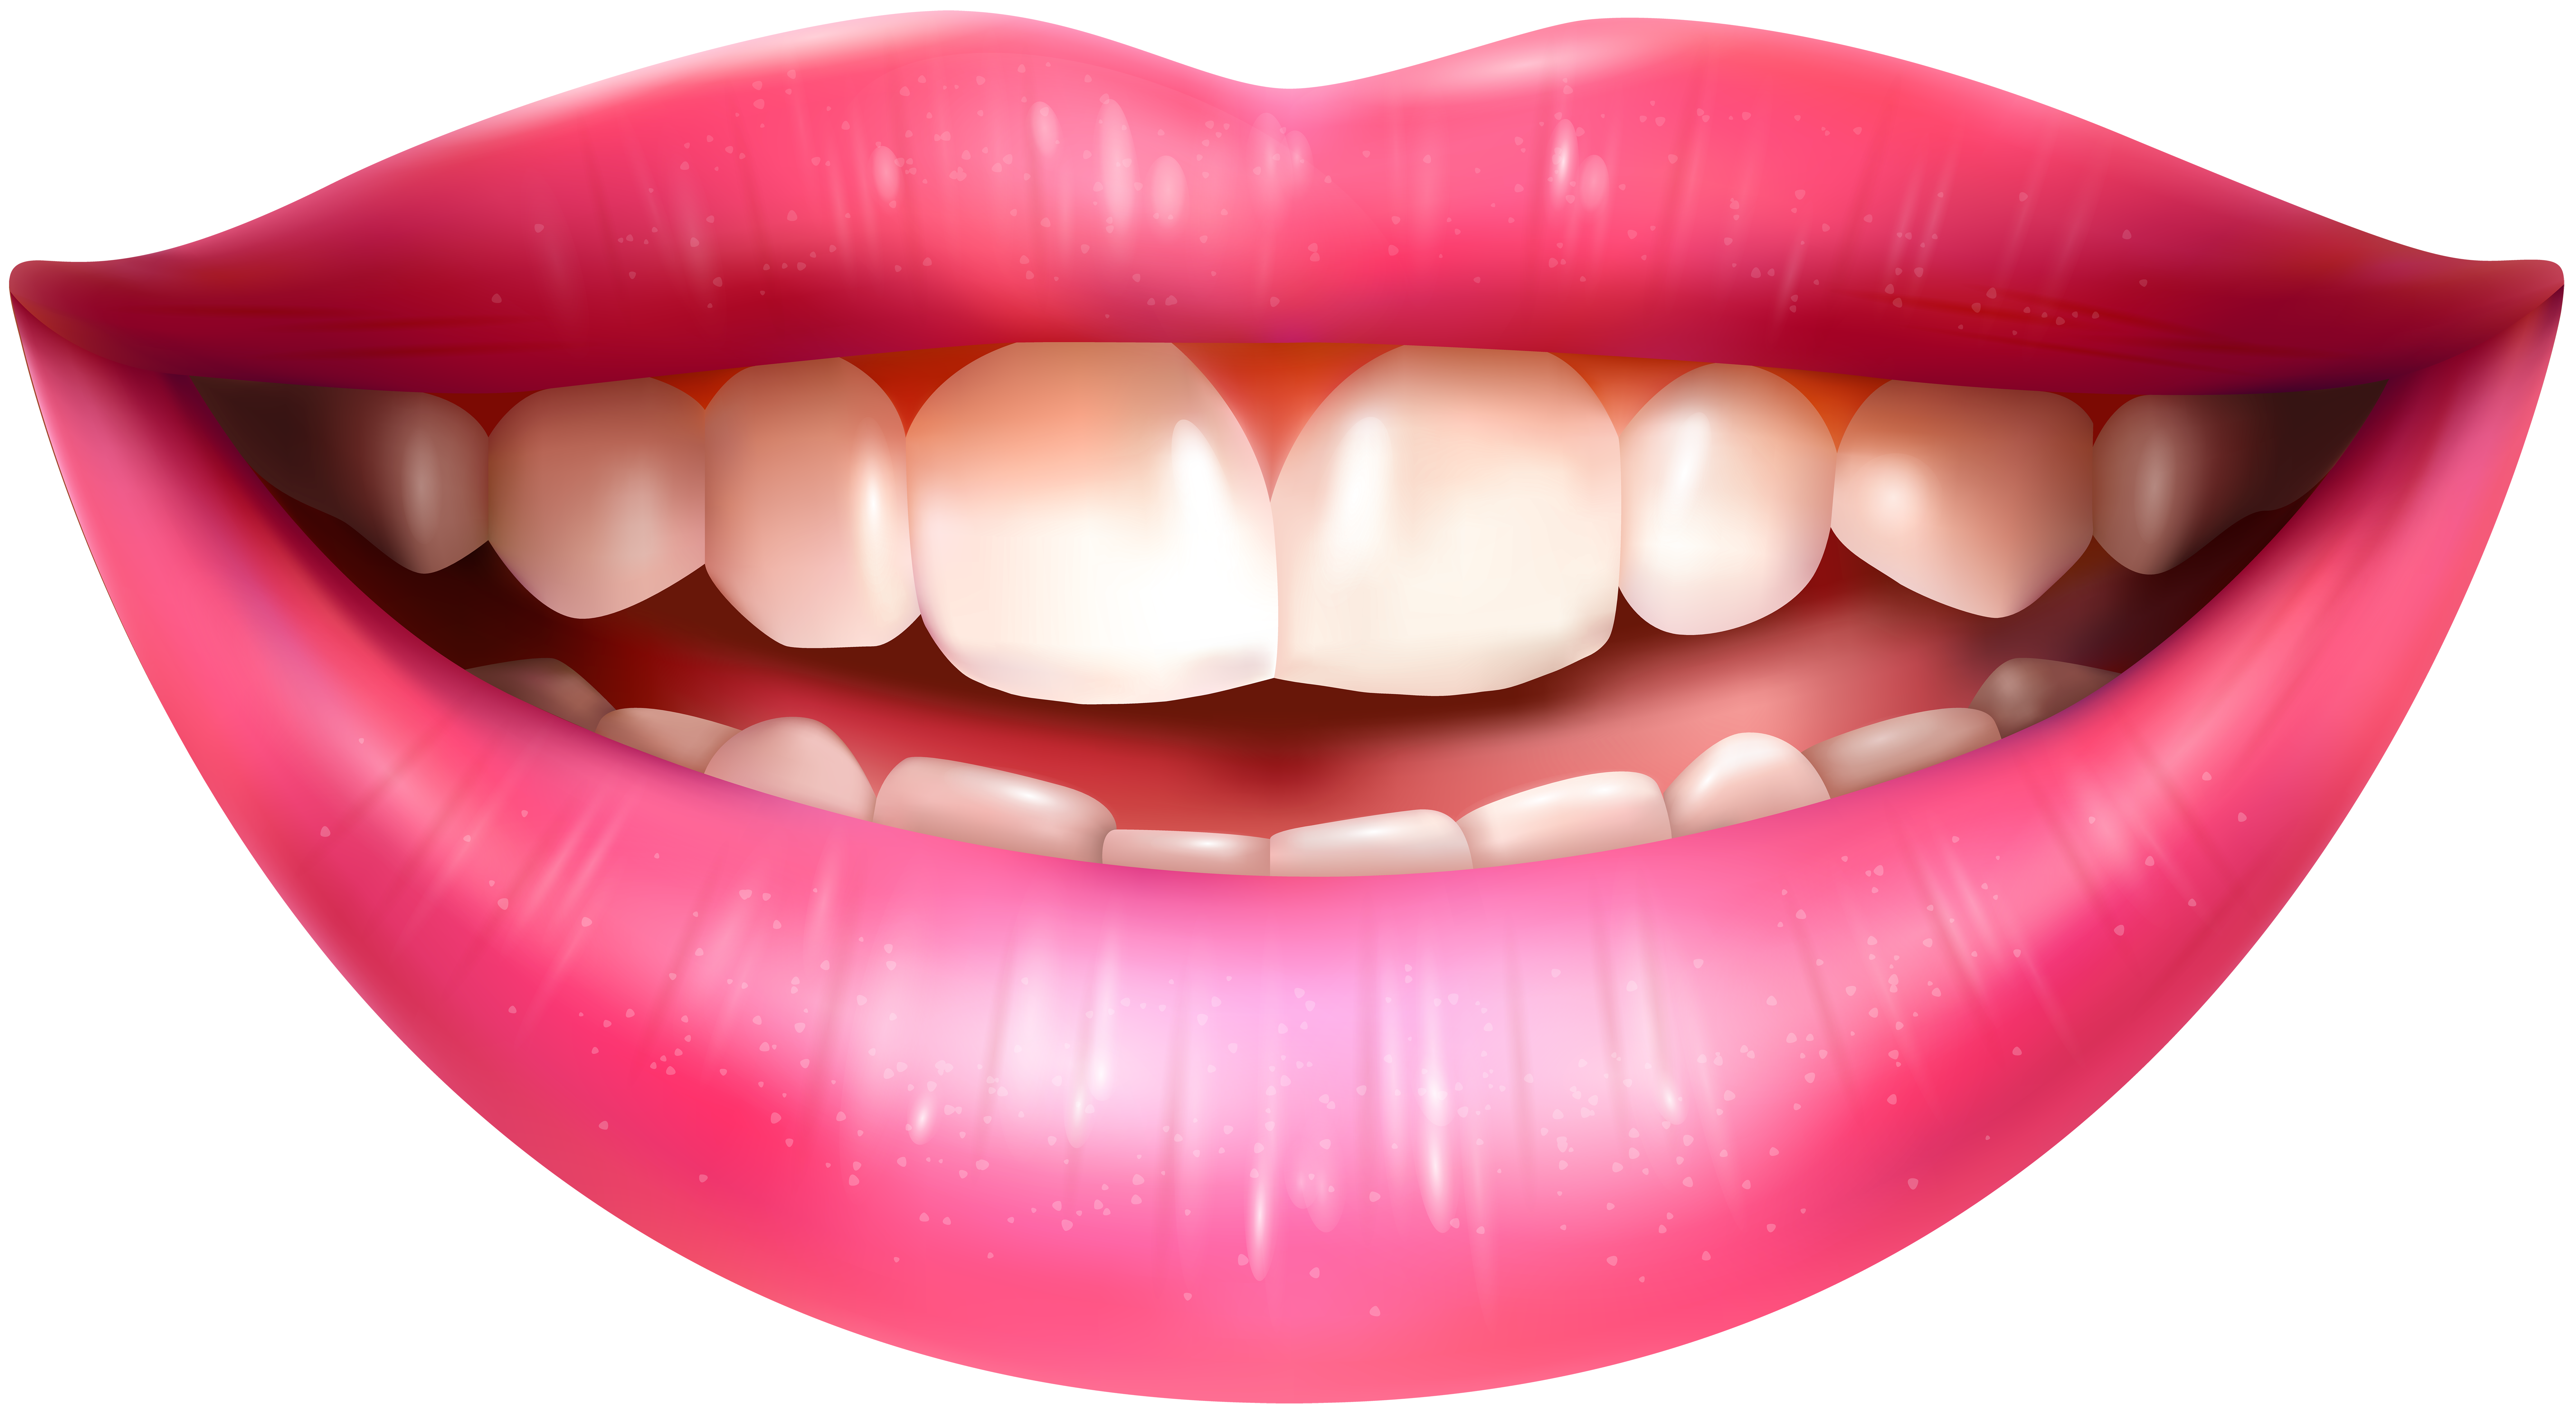 Clipart money smiles graphic transparent download Smiling Mouth PNG Clip Art - Best WEB Clipart graphic transparent download